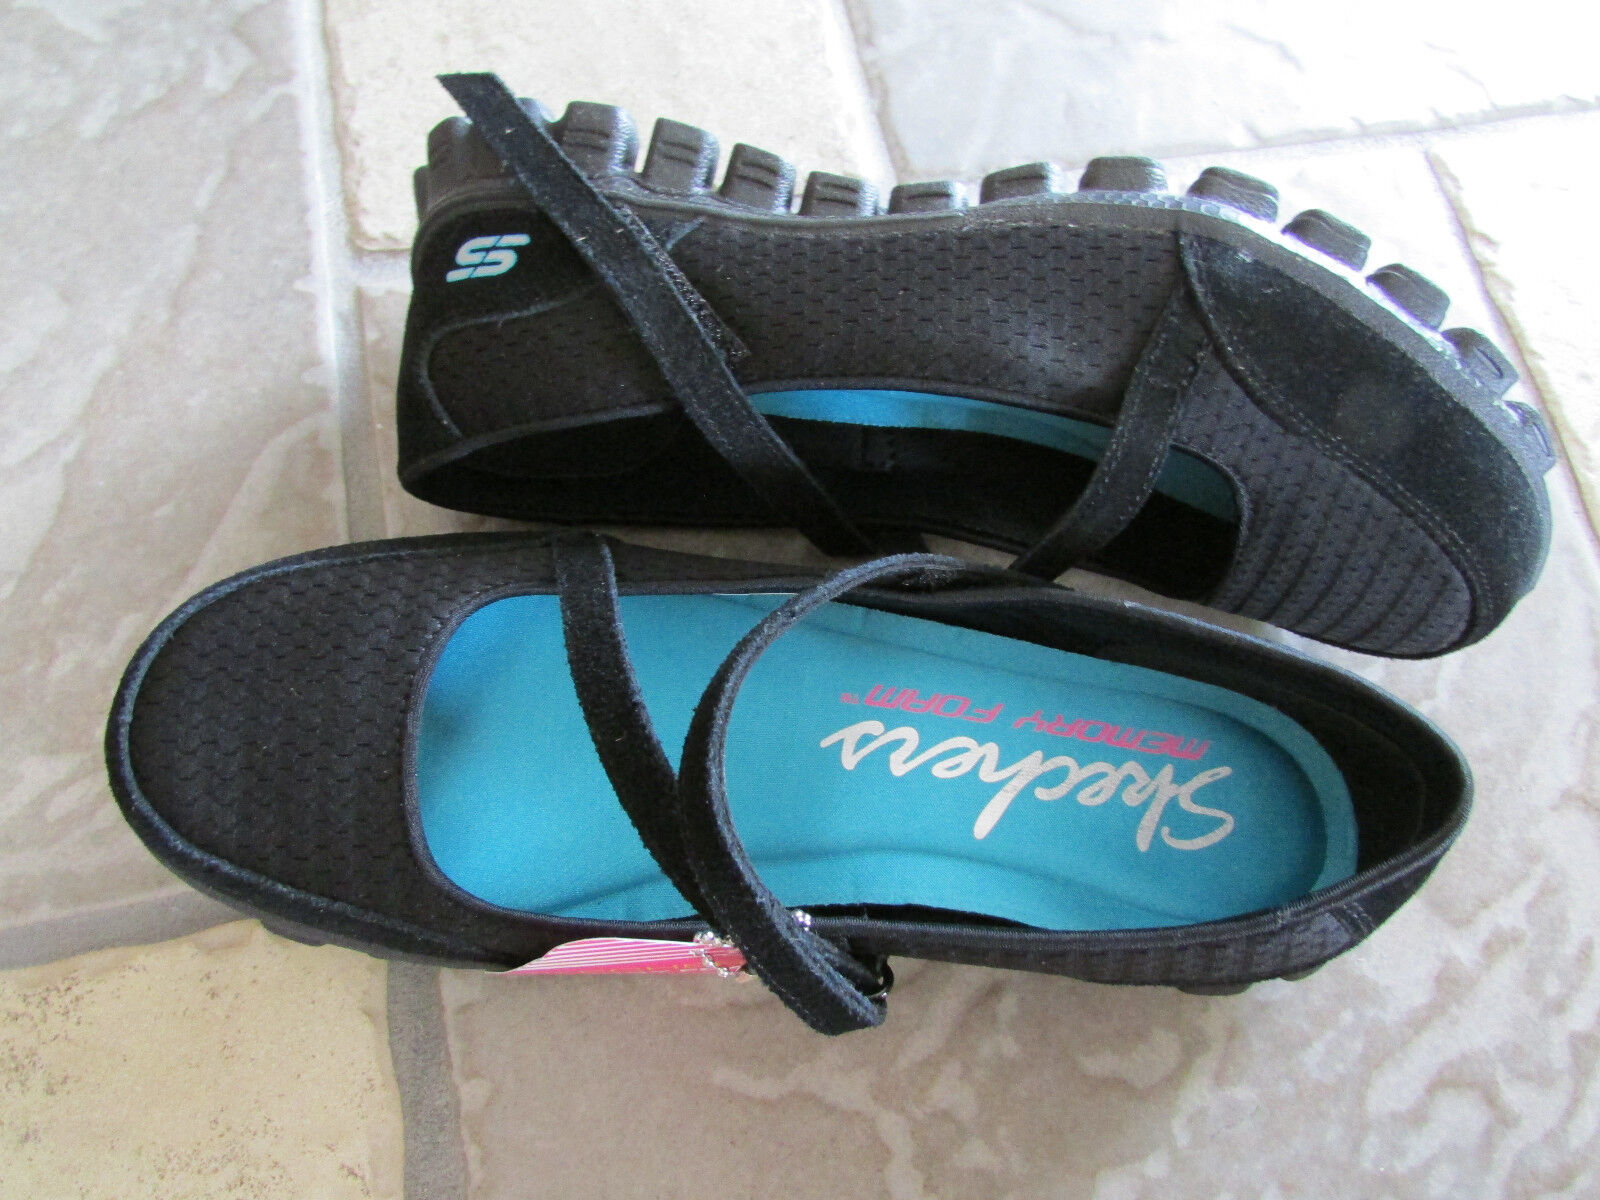 NEW SKECHERS A GAME EZ FLEX MARY BLACK JANE Schuhe Damenschuhe 6.5 BLACK MARY   FREE SHIP 9a106e